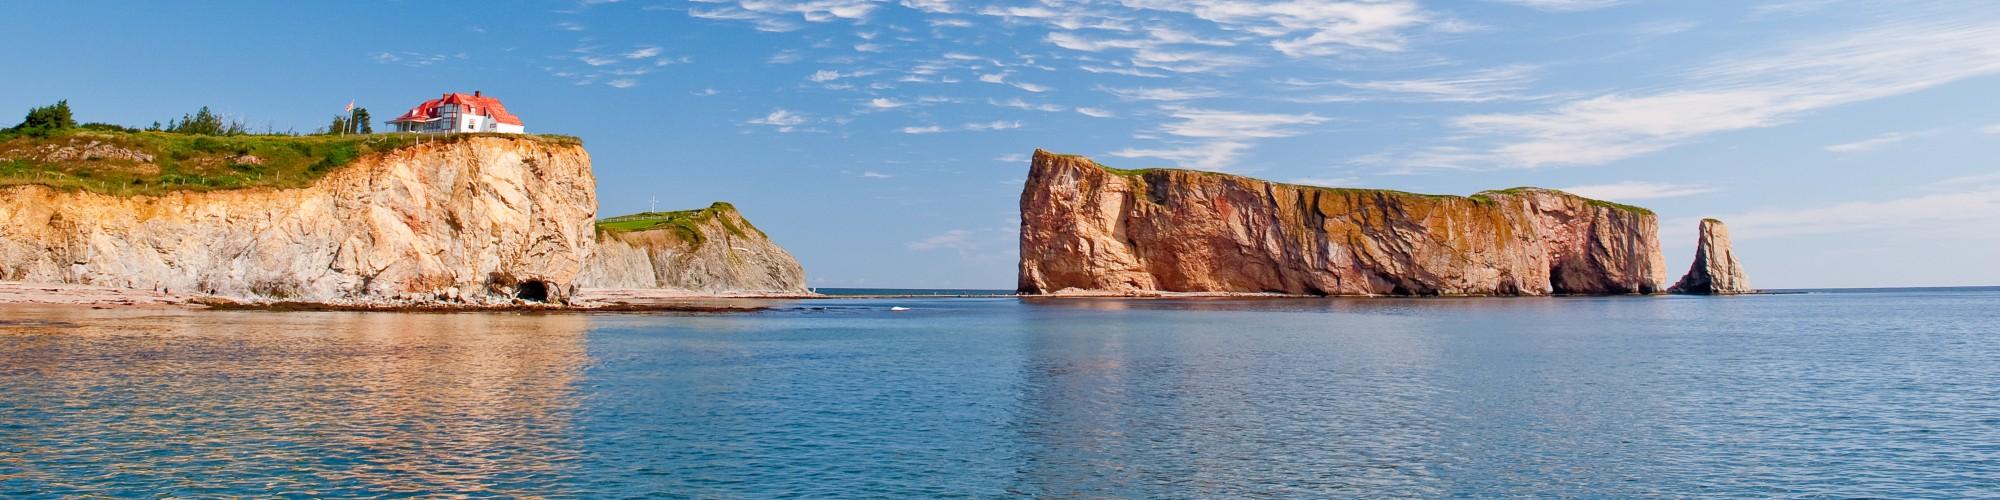 Landscape, blue sky, Percé Rock